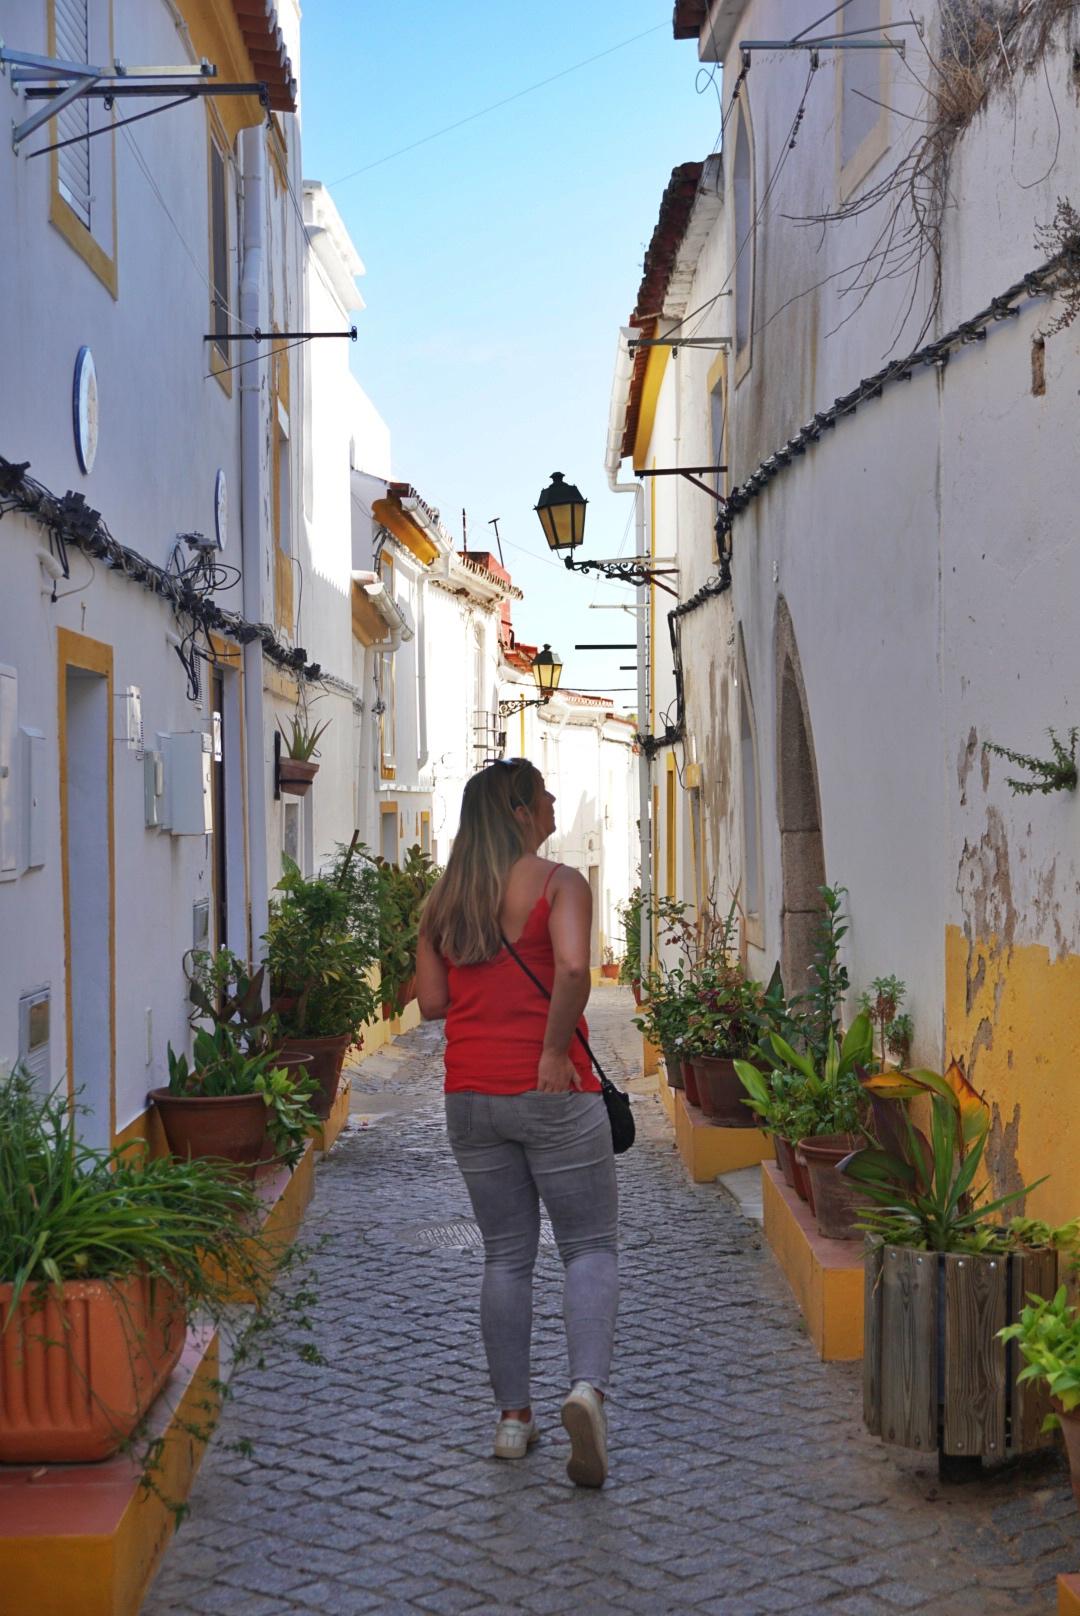 Indian summer in Portugal, Alentejo Region - the streets of Elvas